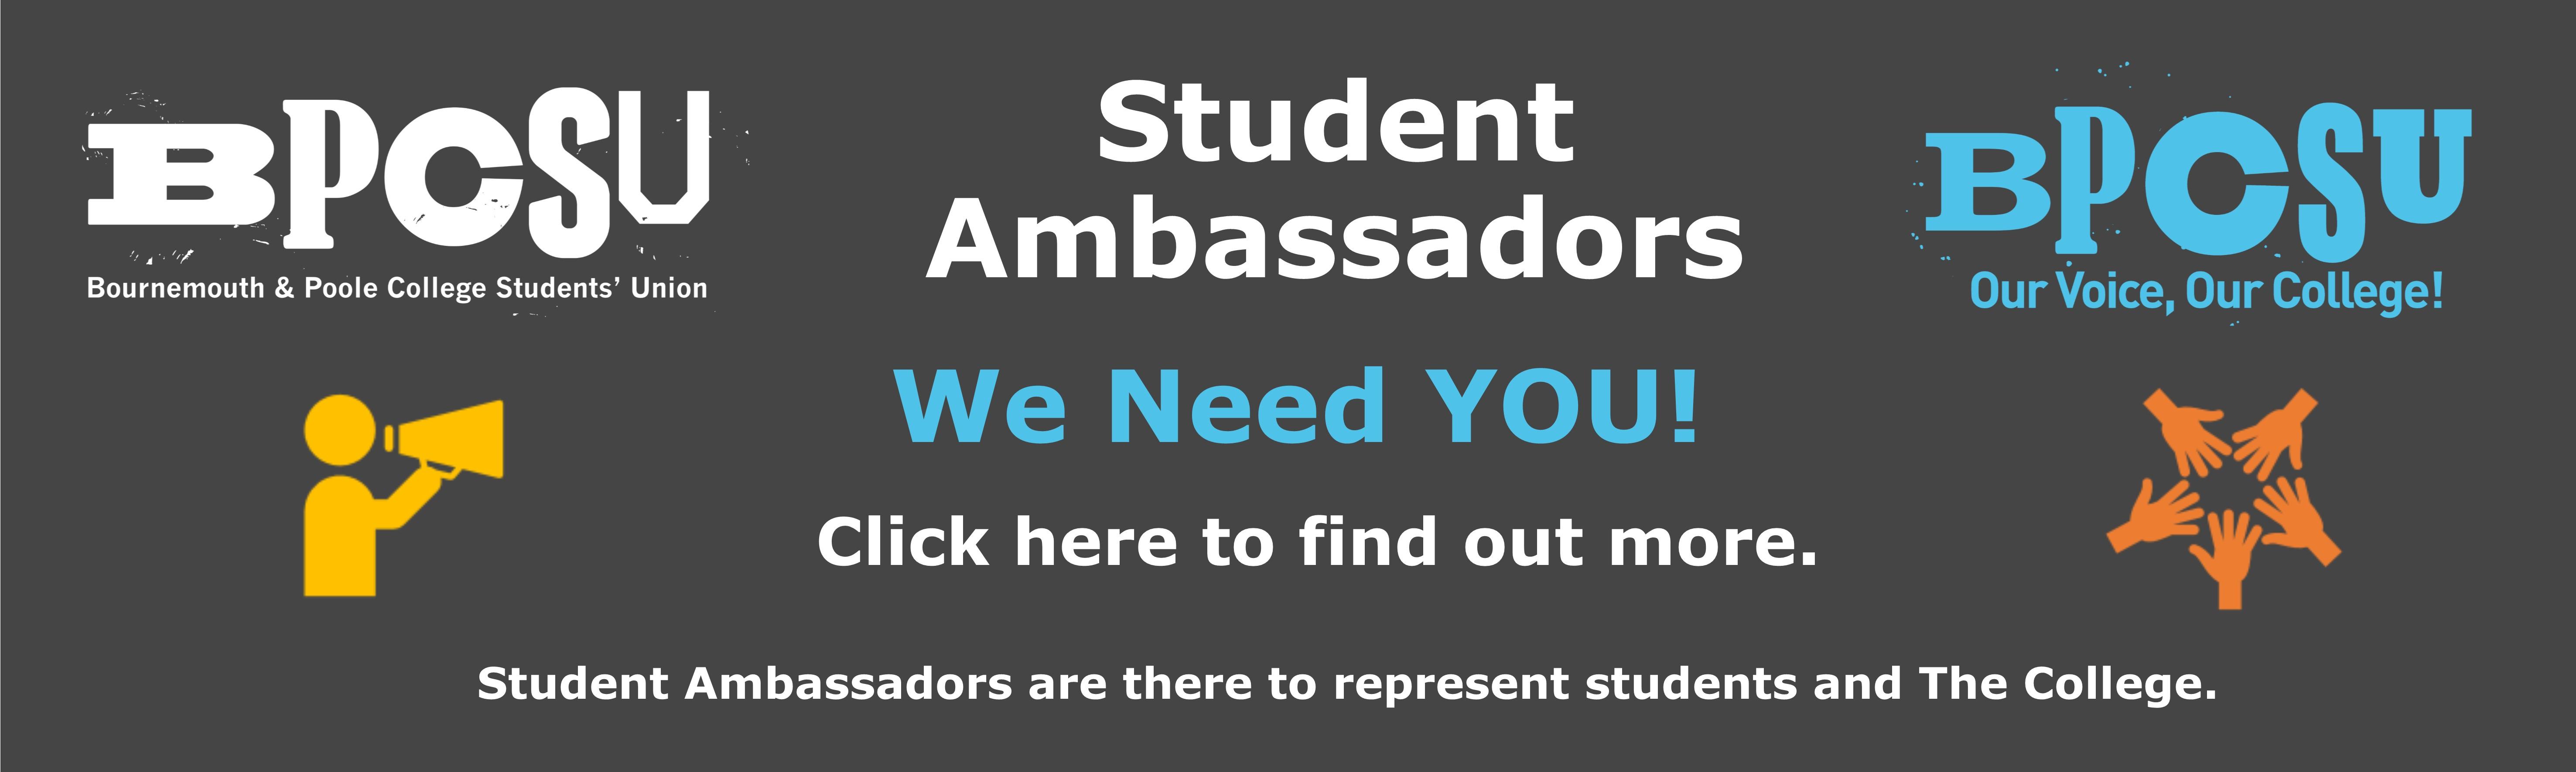 Ambassador web banner 2